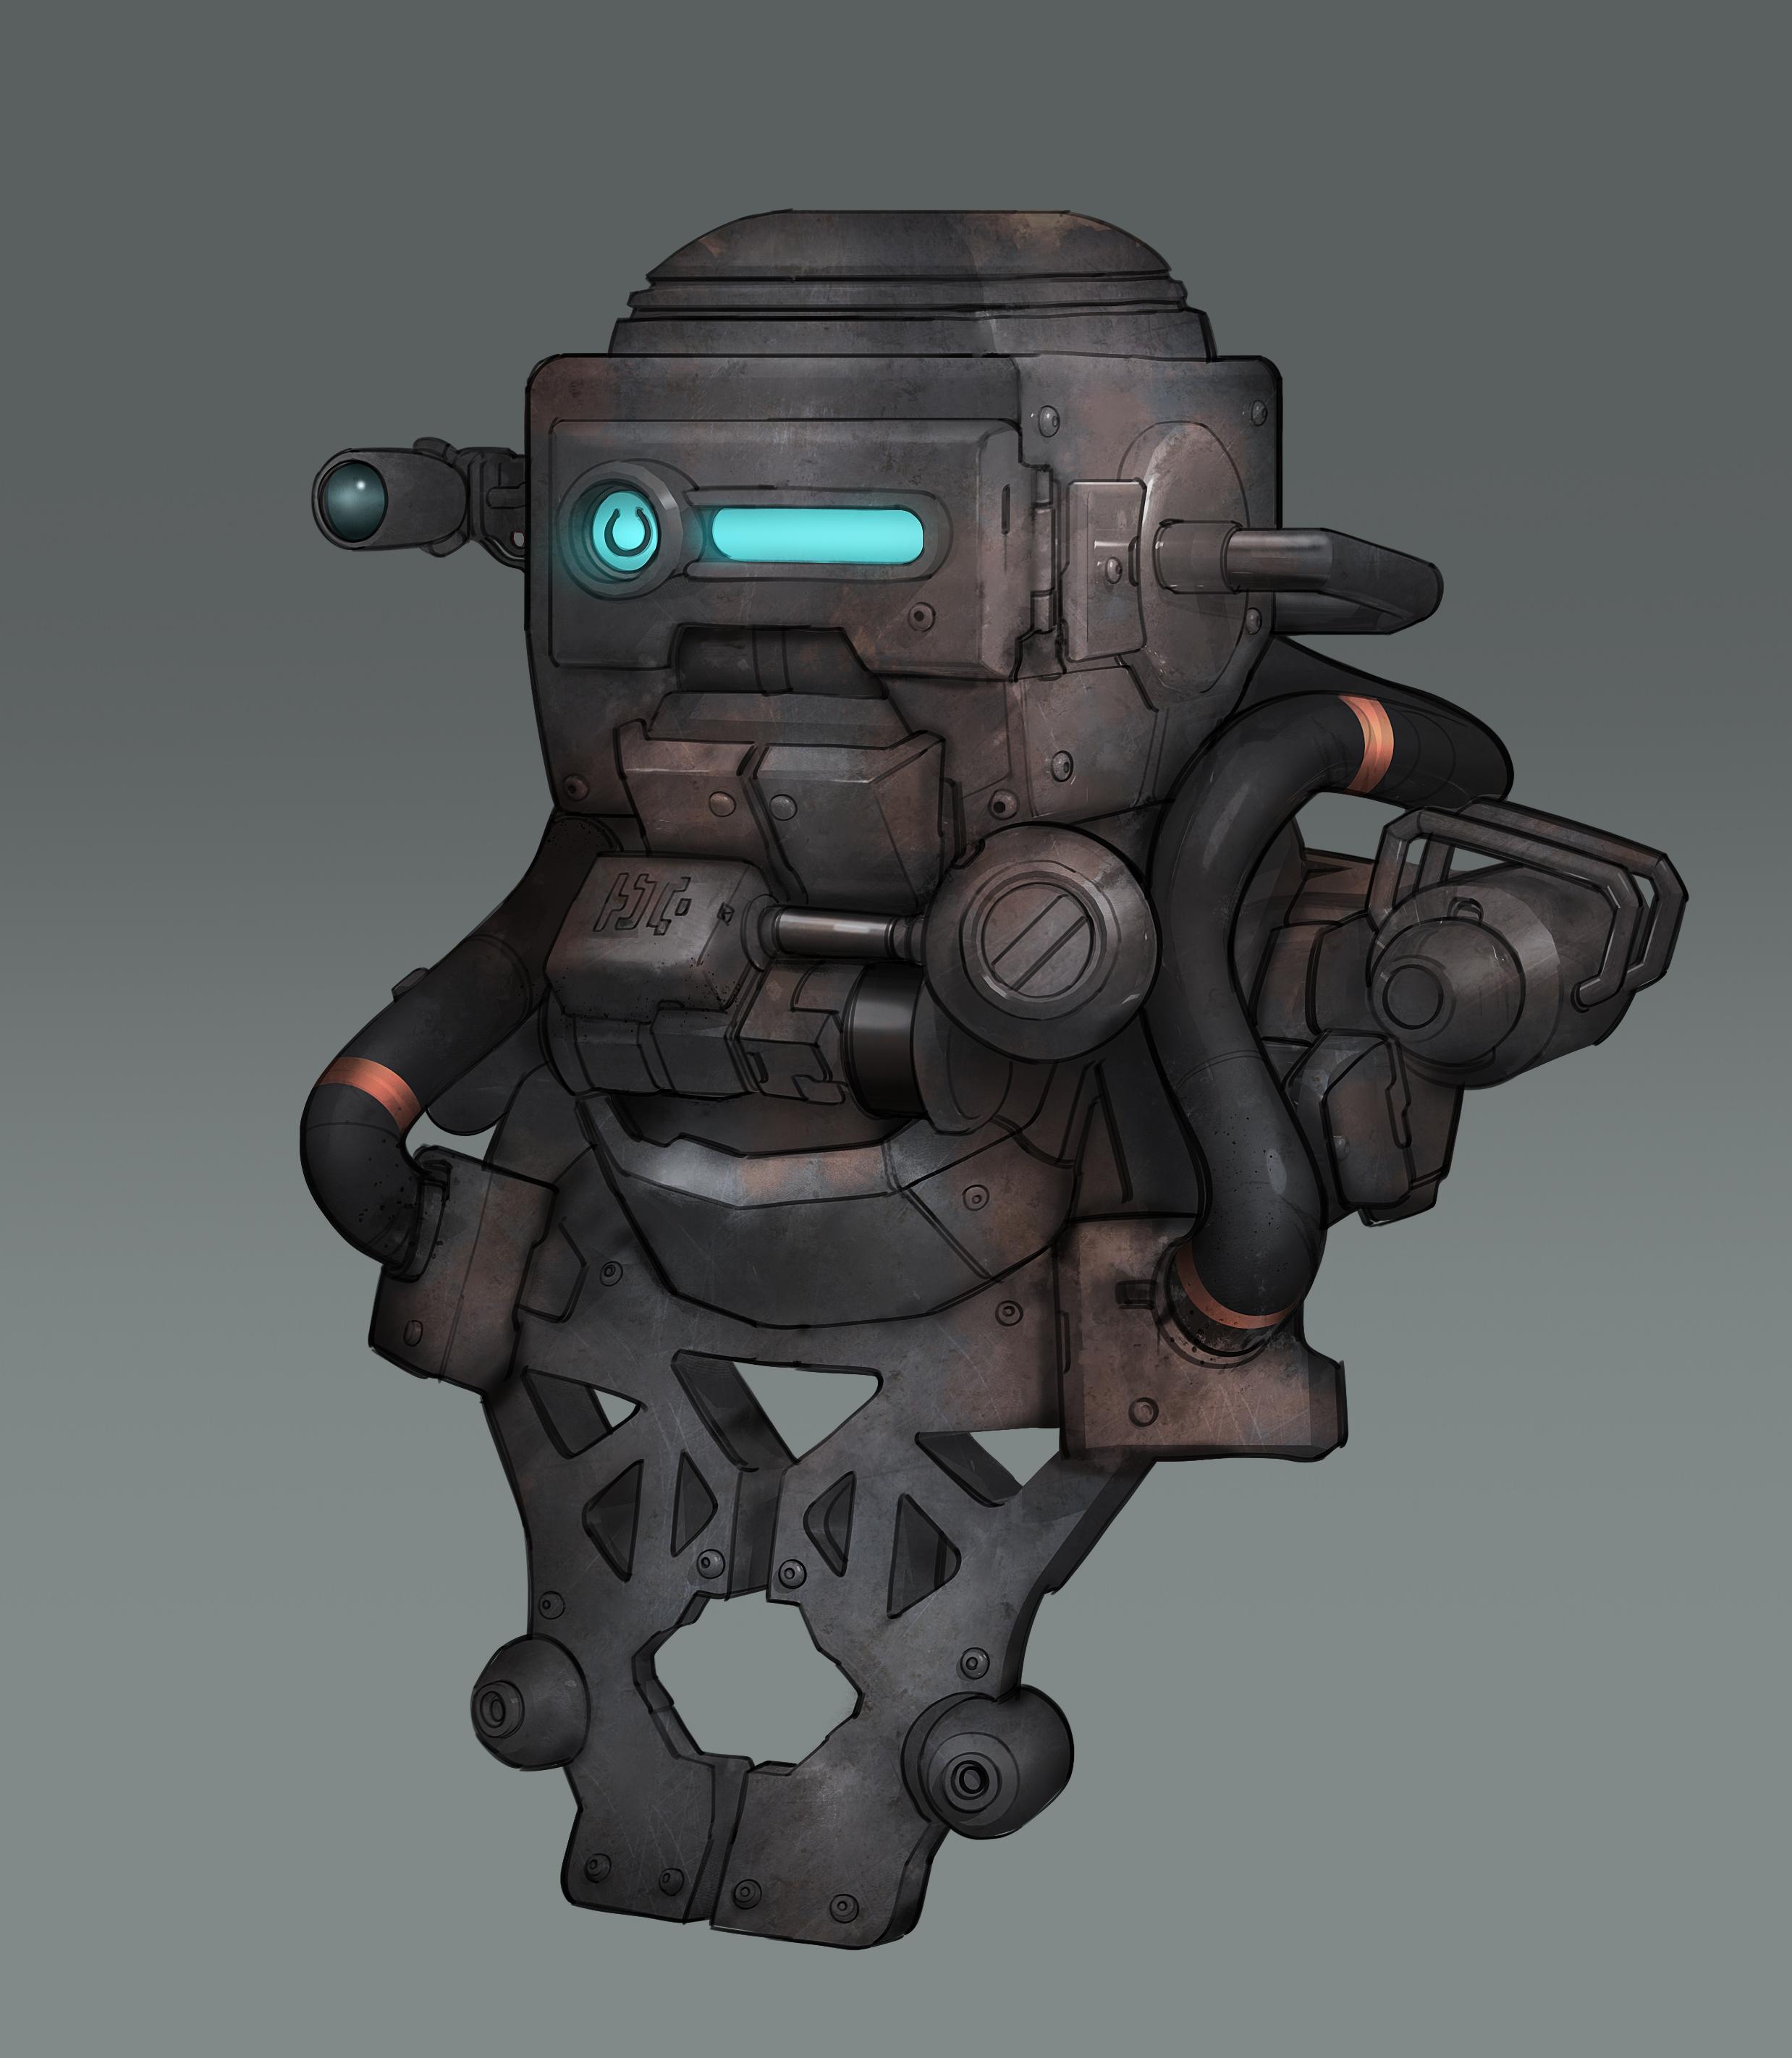 Mech Concept Design